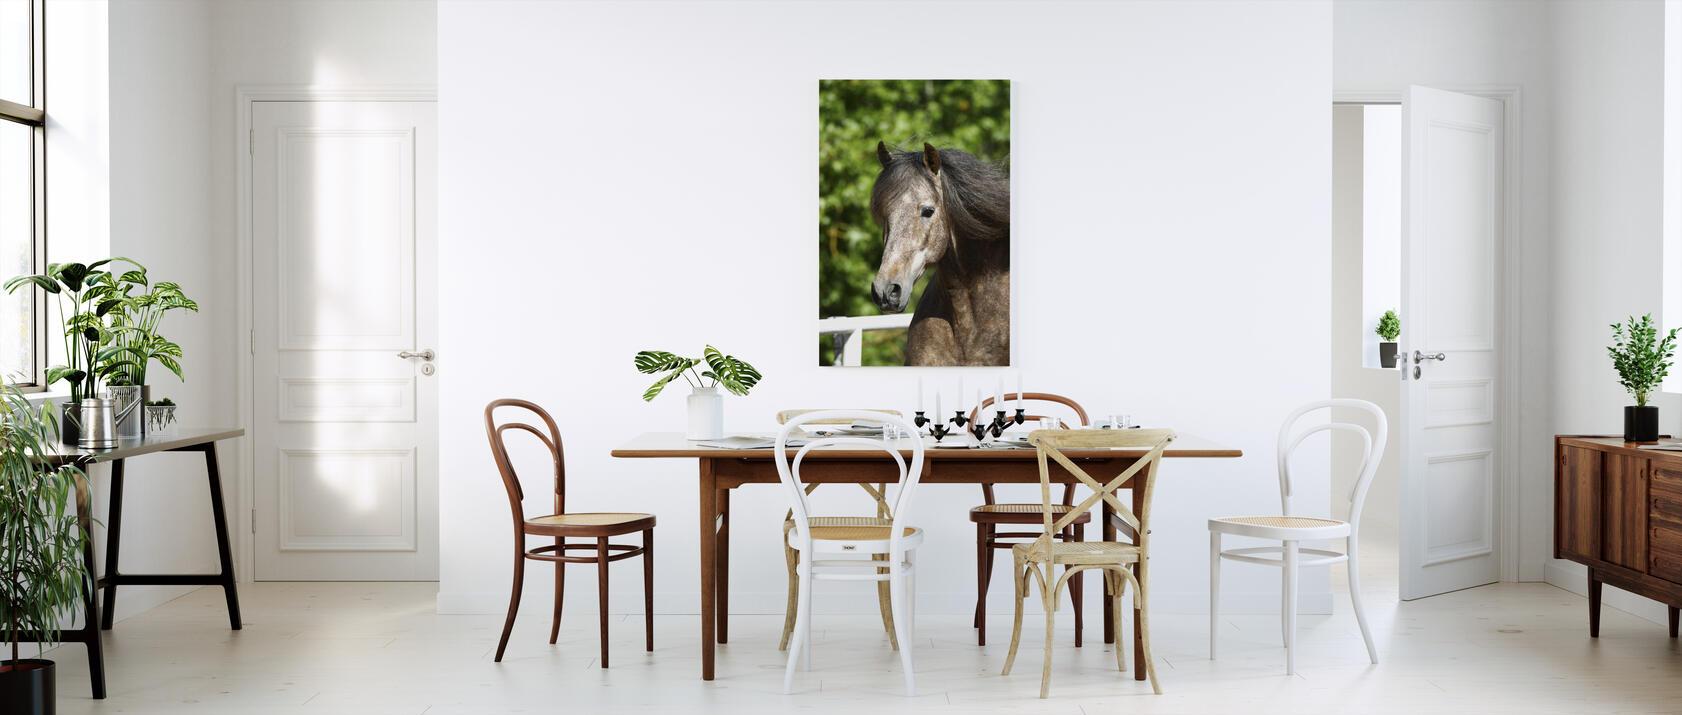 andalusian green leaves tableau de designer imprim sur toile photowall. Black Bedroom Furniture Sets. Home Design Ideas